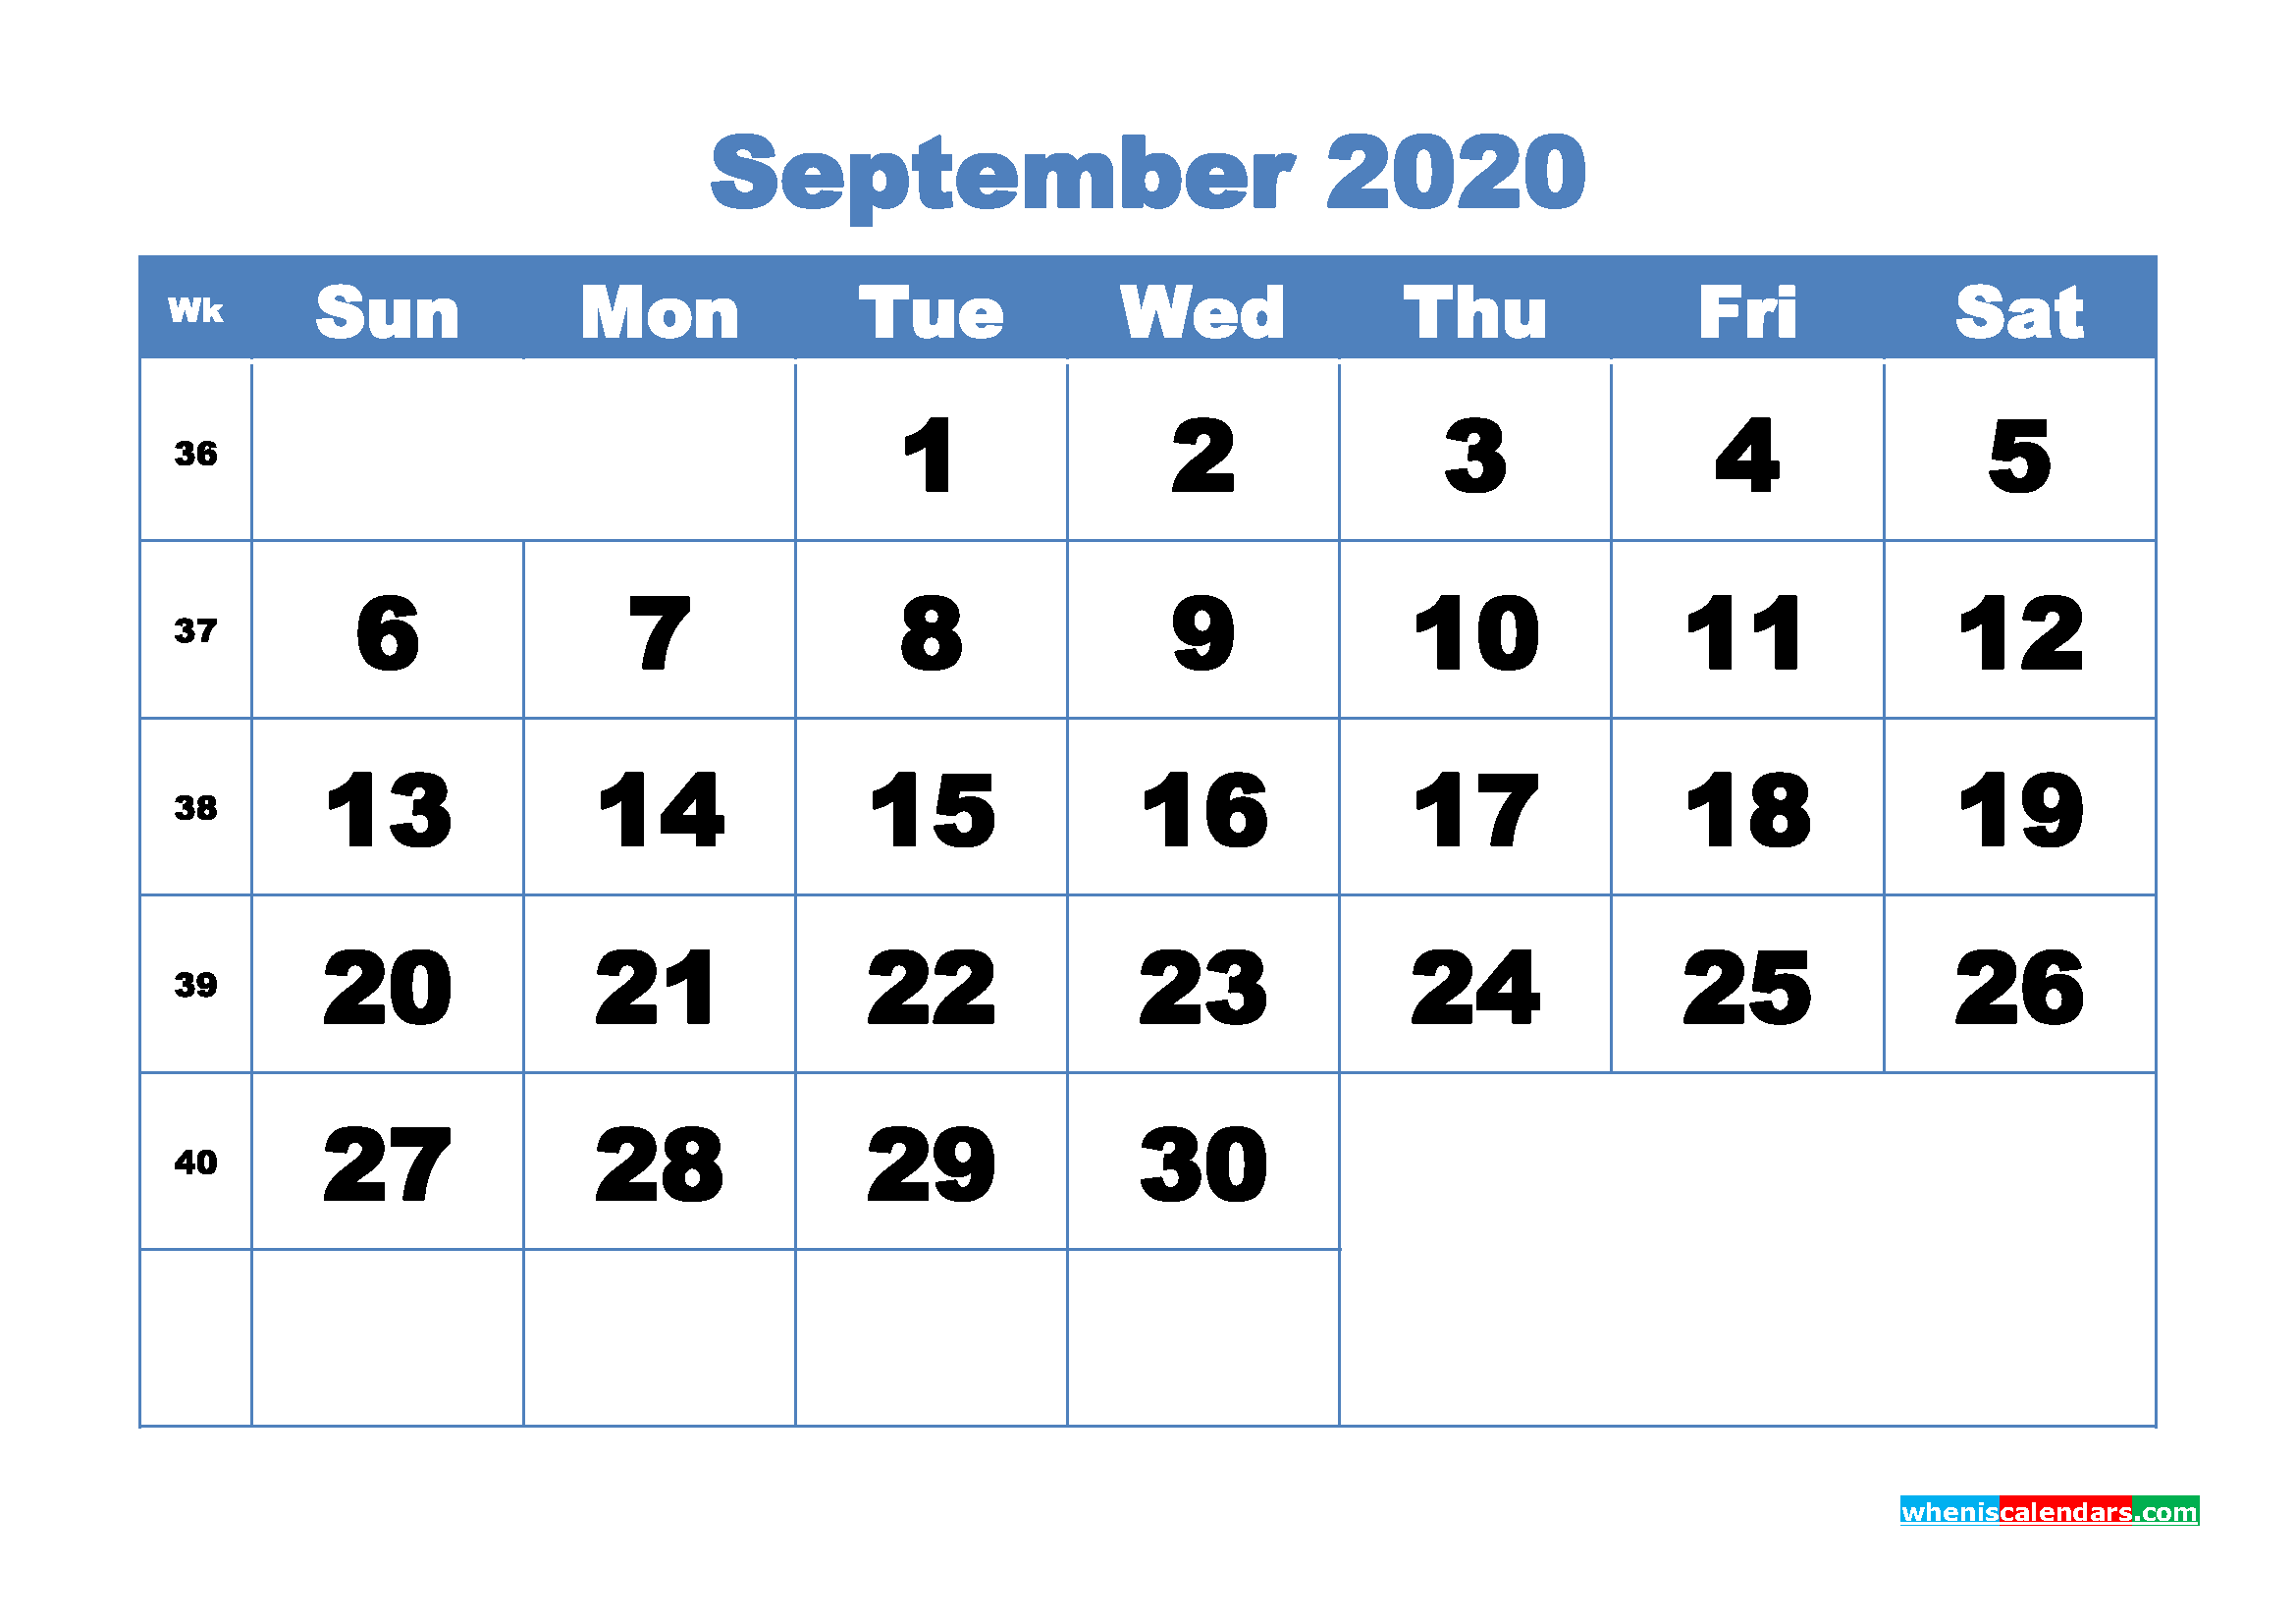 September Printable Calendar 2020 PDF, Word - No.m20b309